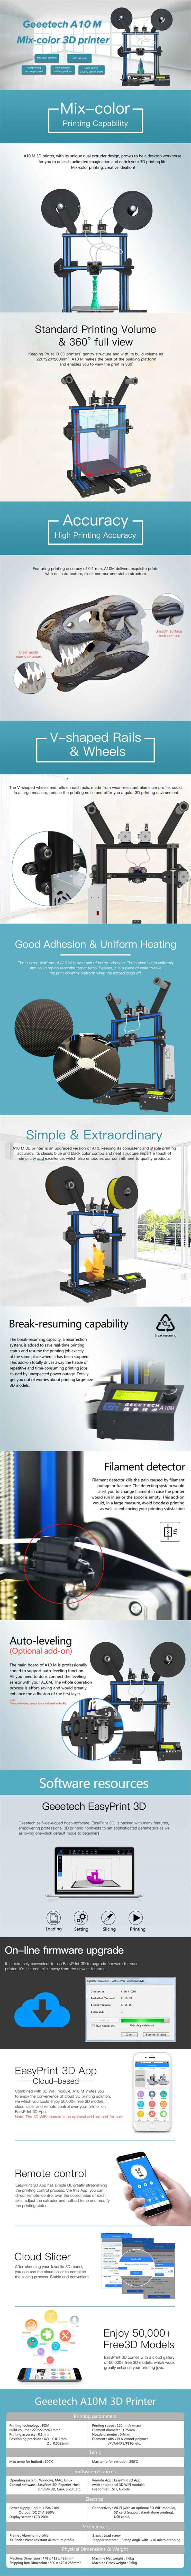 Geeetech A10M Mix Color 3D Printer | 3D Printer | Color 3d printer